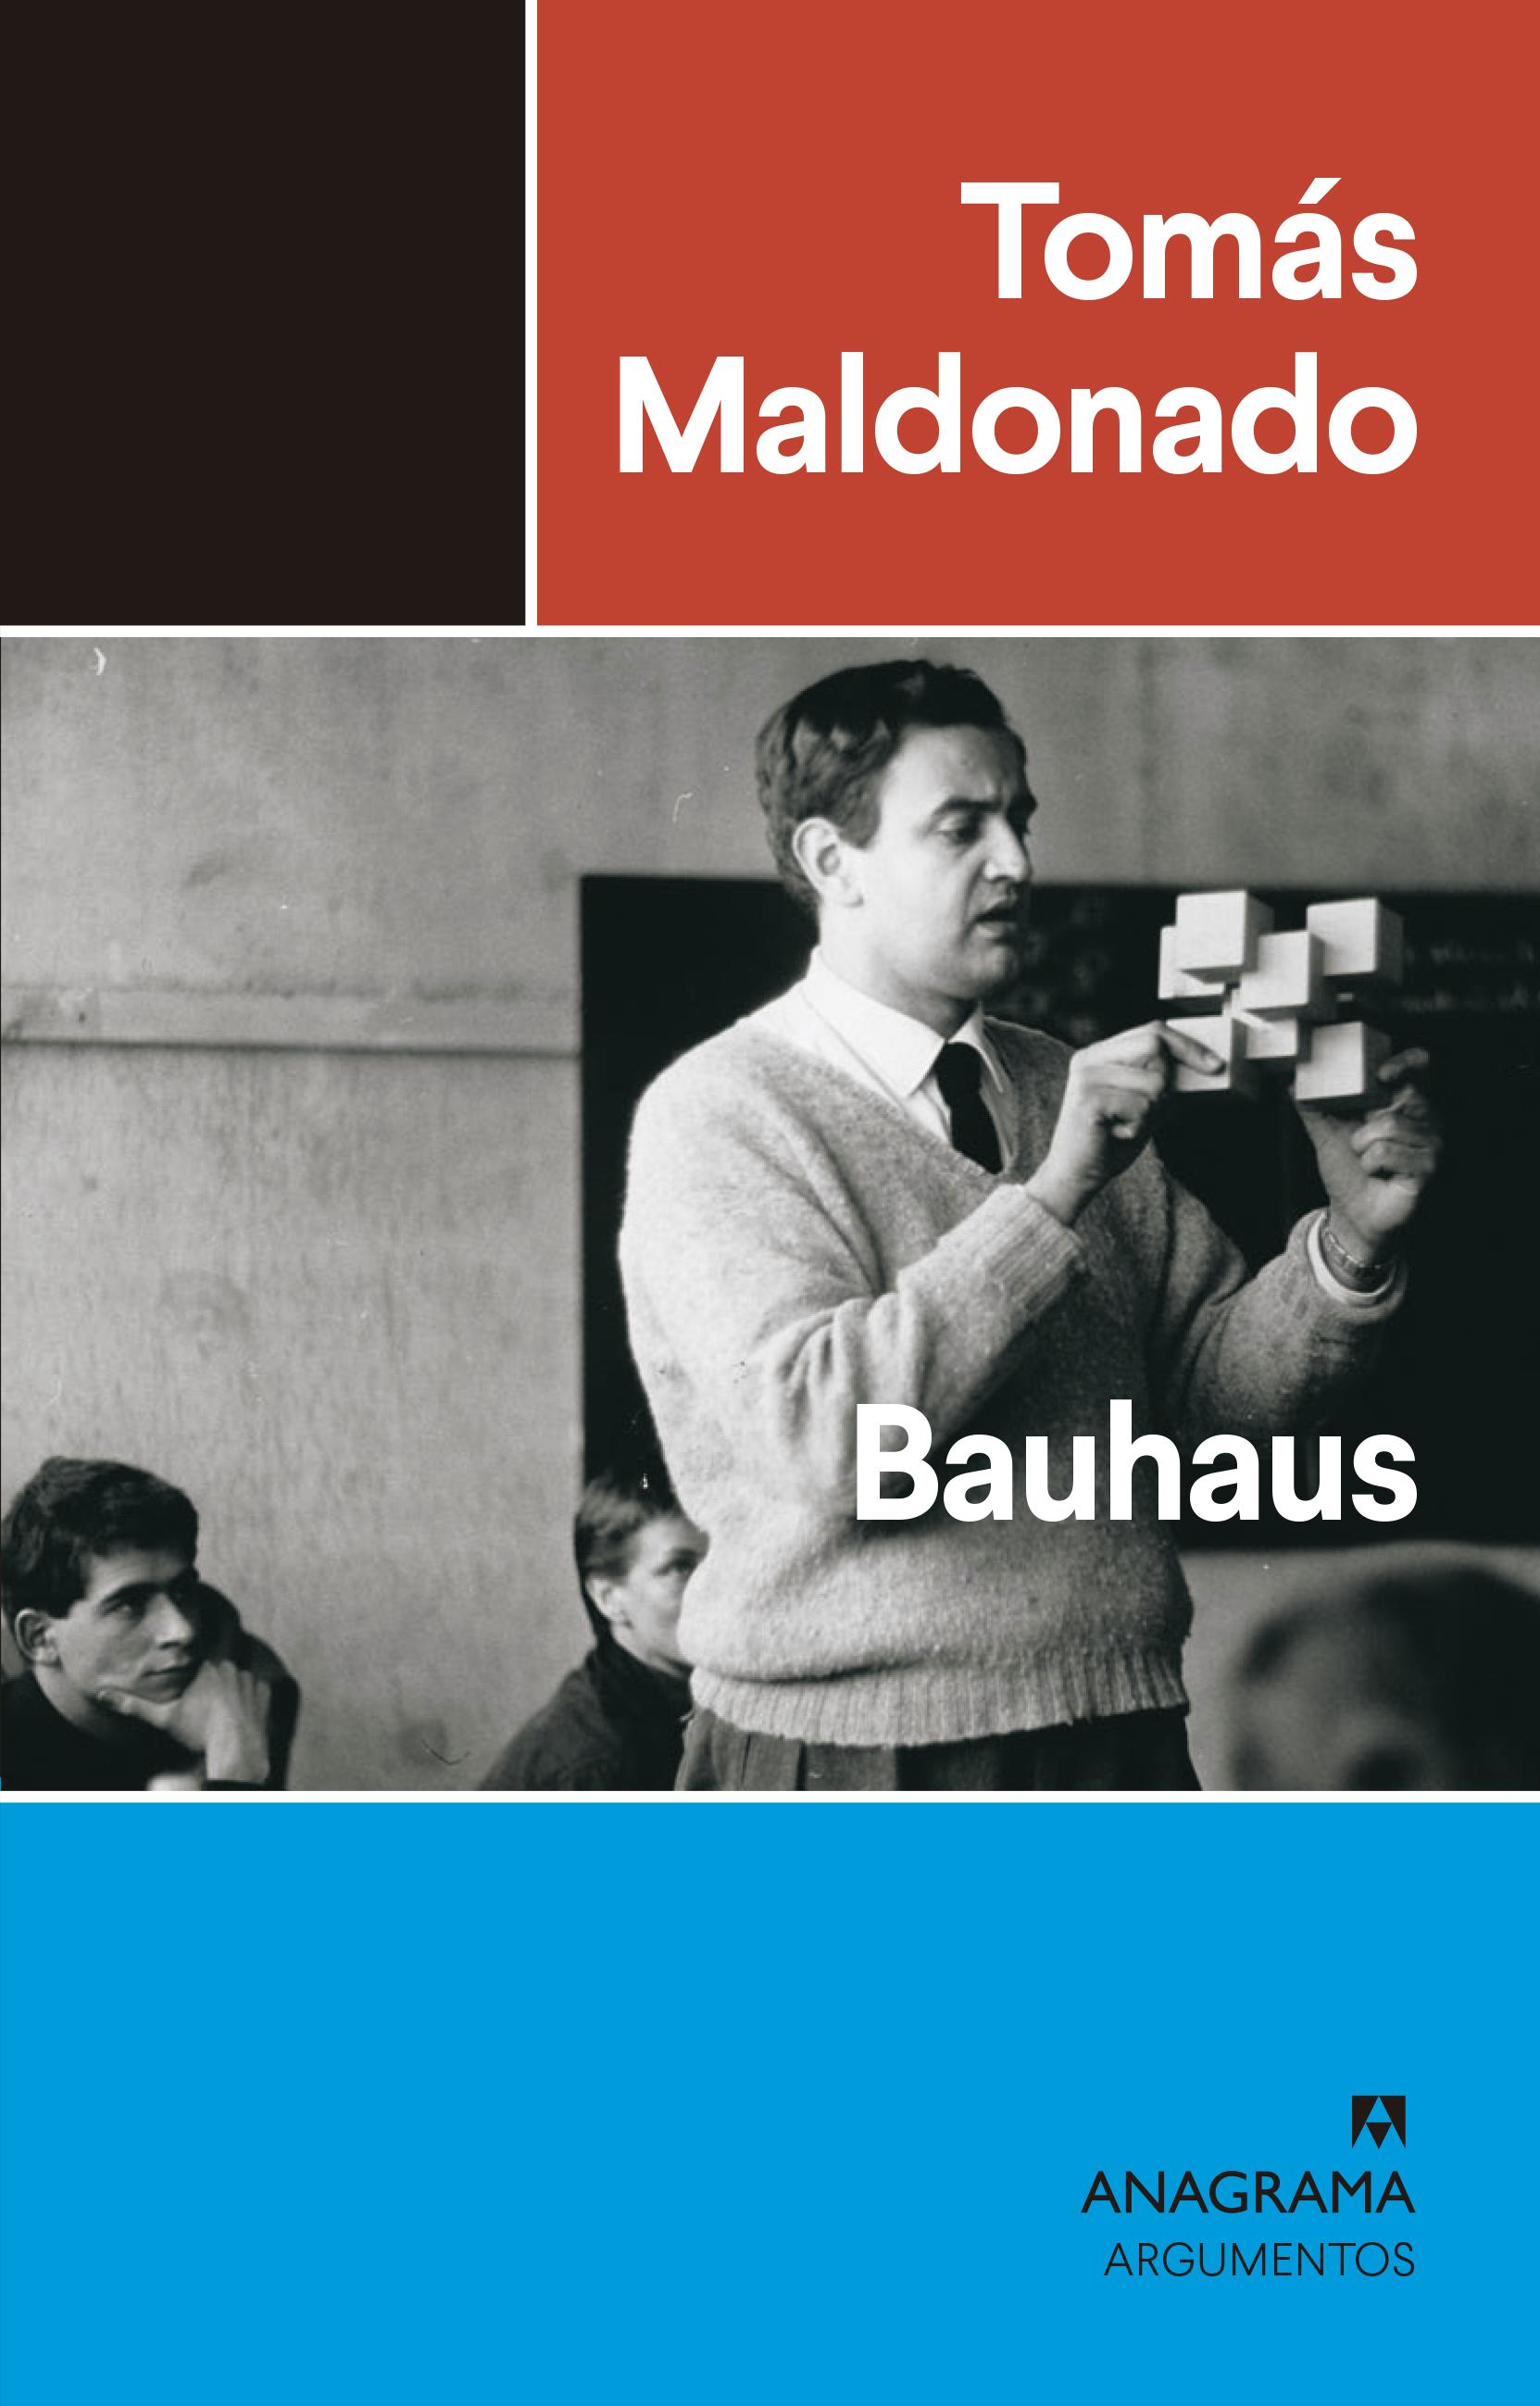 Bauhaus - Maldonado Tomás